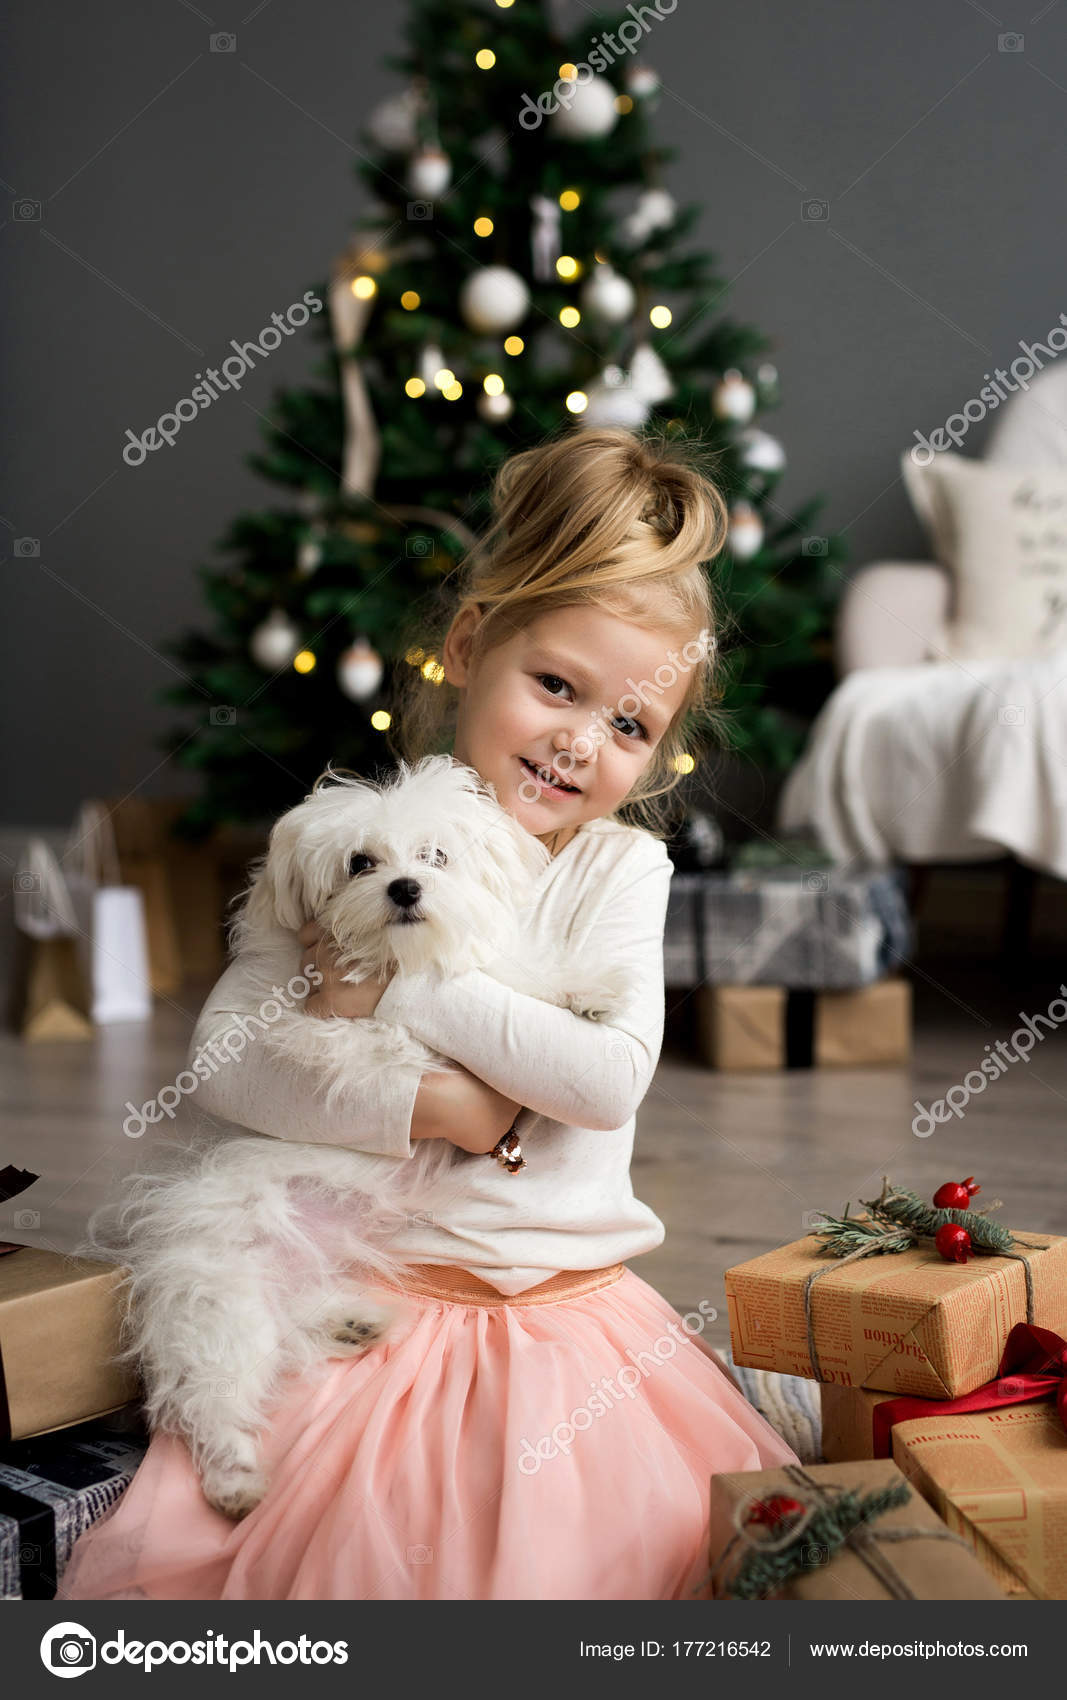 Merry christmas beautiful girl